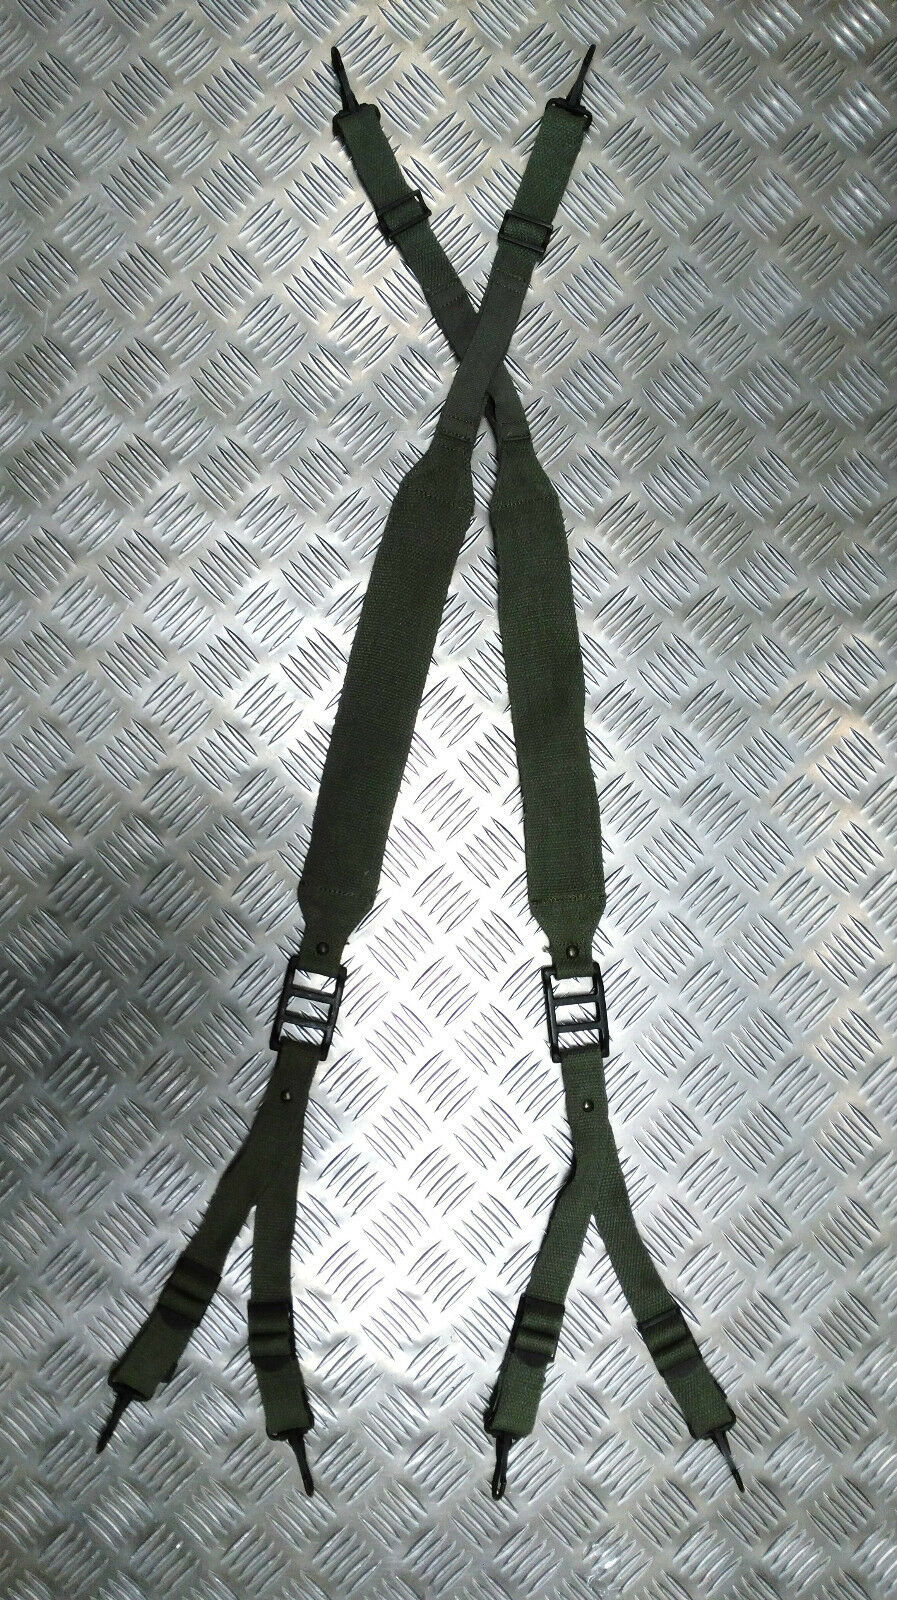 Original Military Ausgabe Grün Web Joch / Strumpfhalter / Bandage 6 Punkt Band -